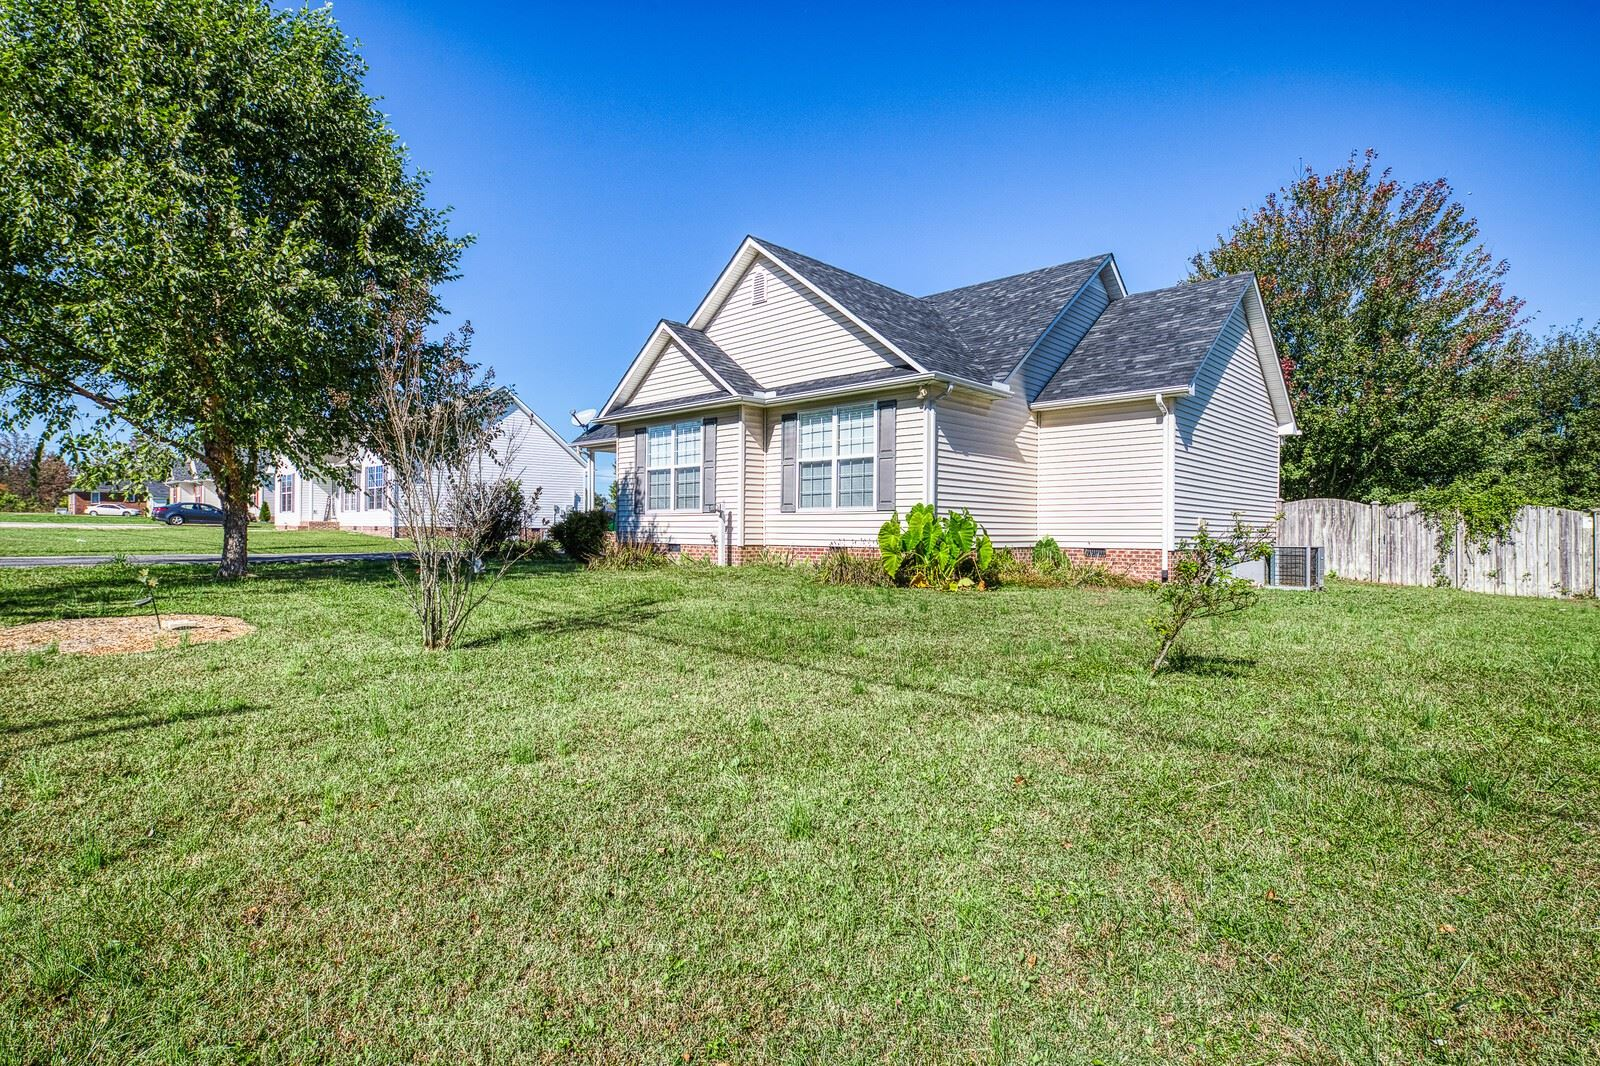 130 Greenwood Dr, Smithville, TN 37166 - MLS#: 2296672